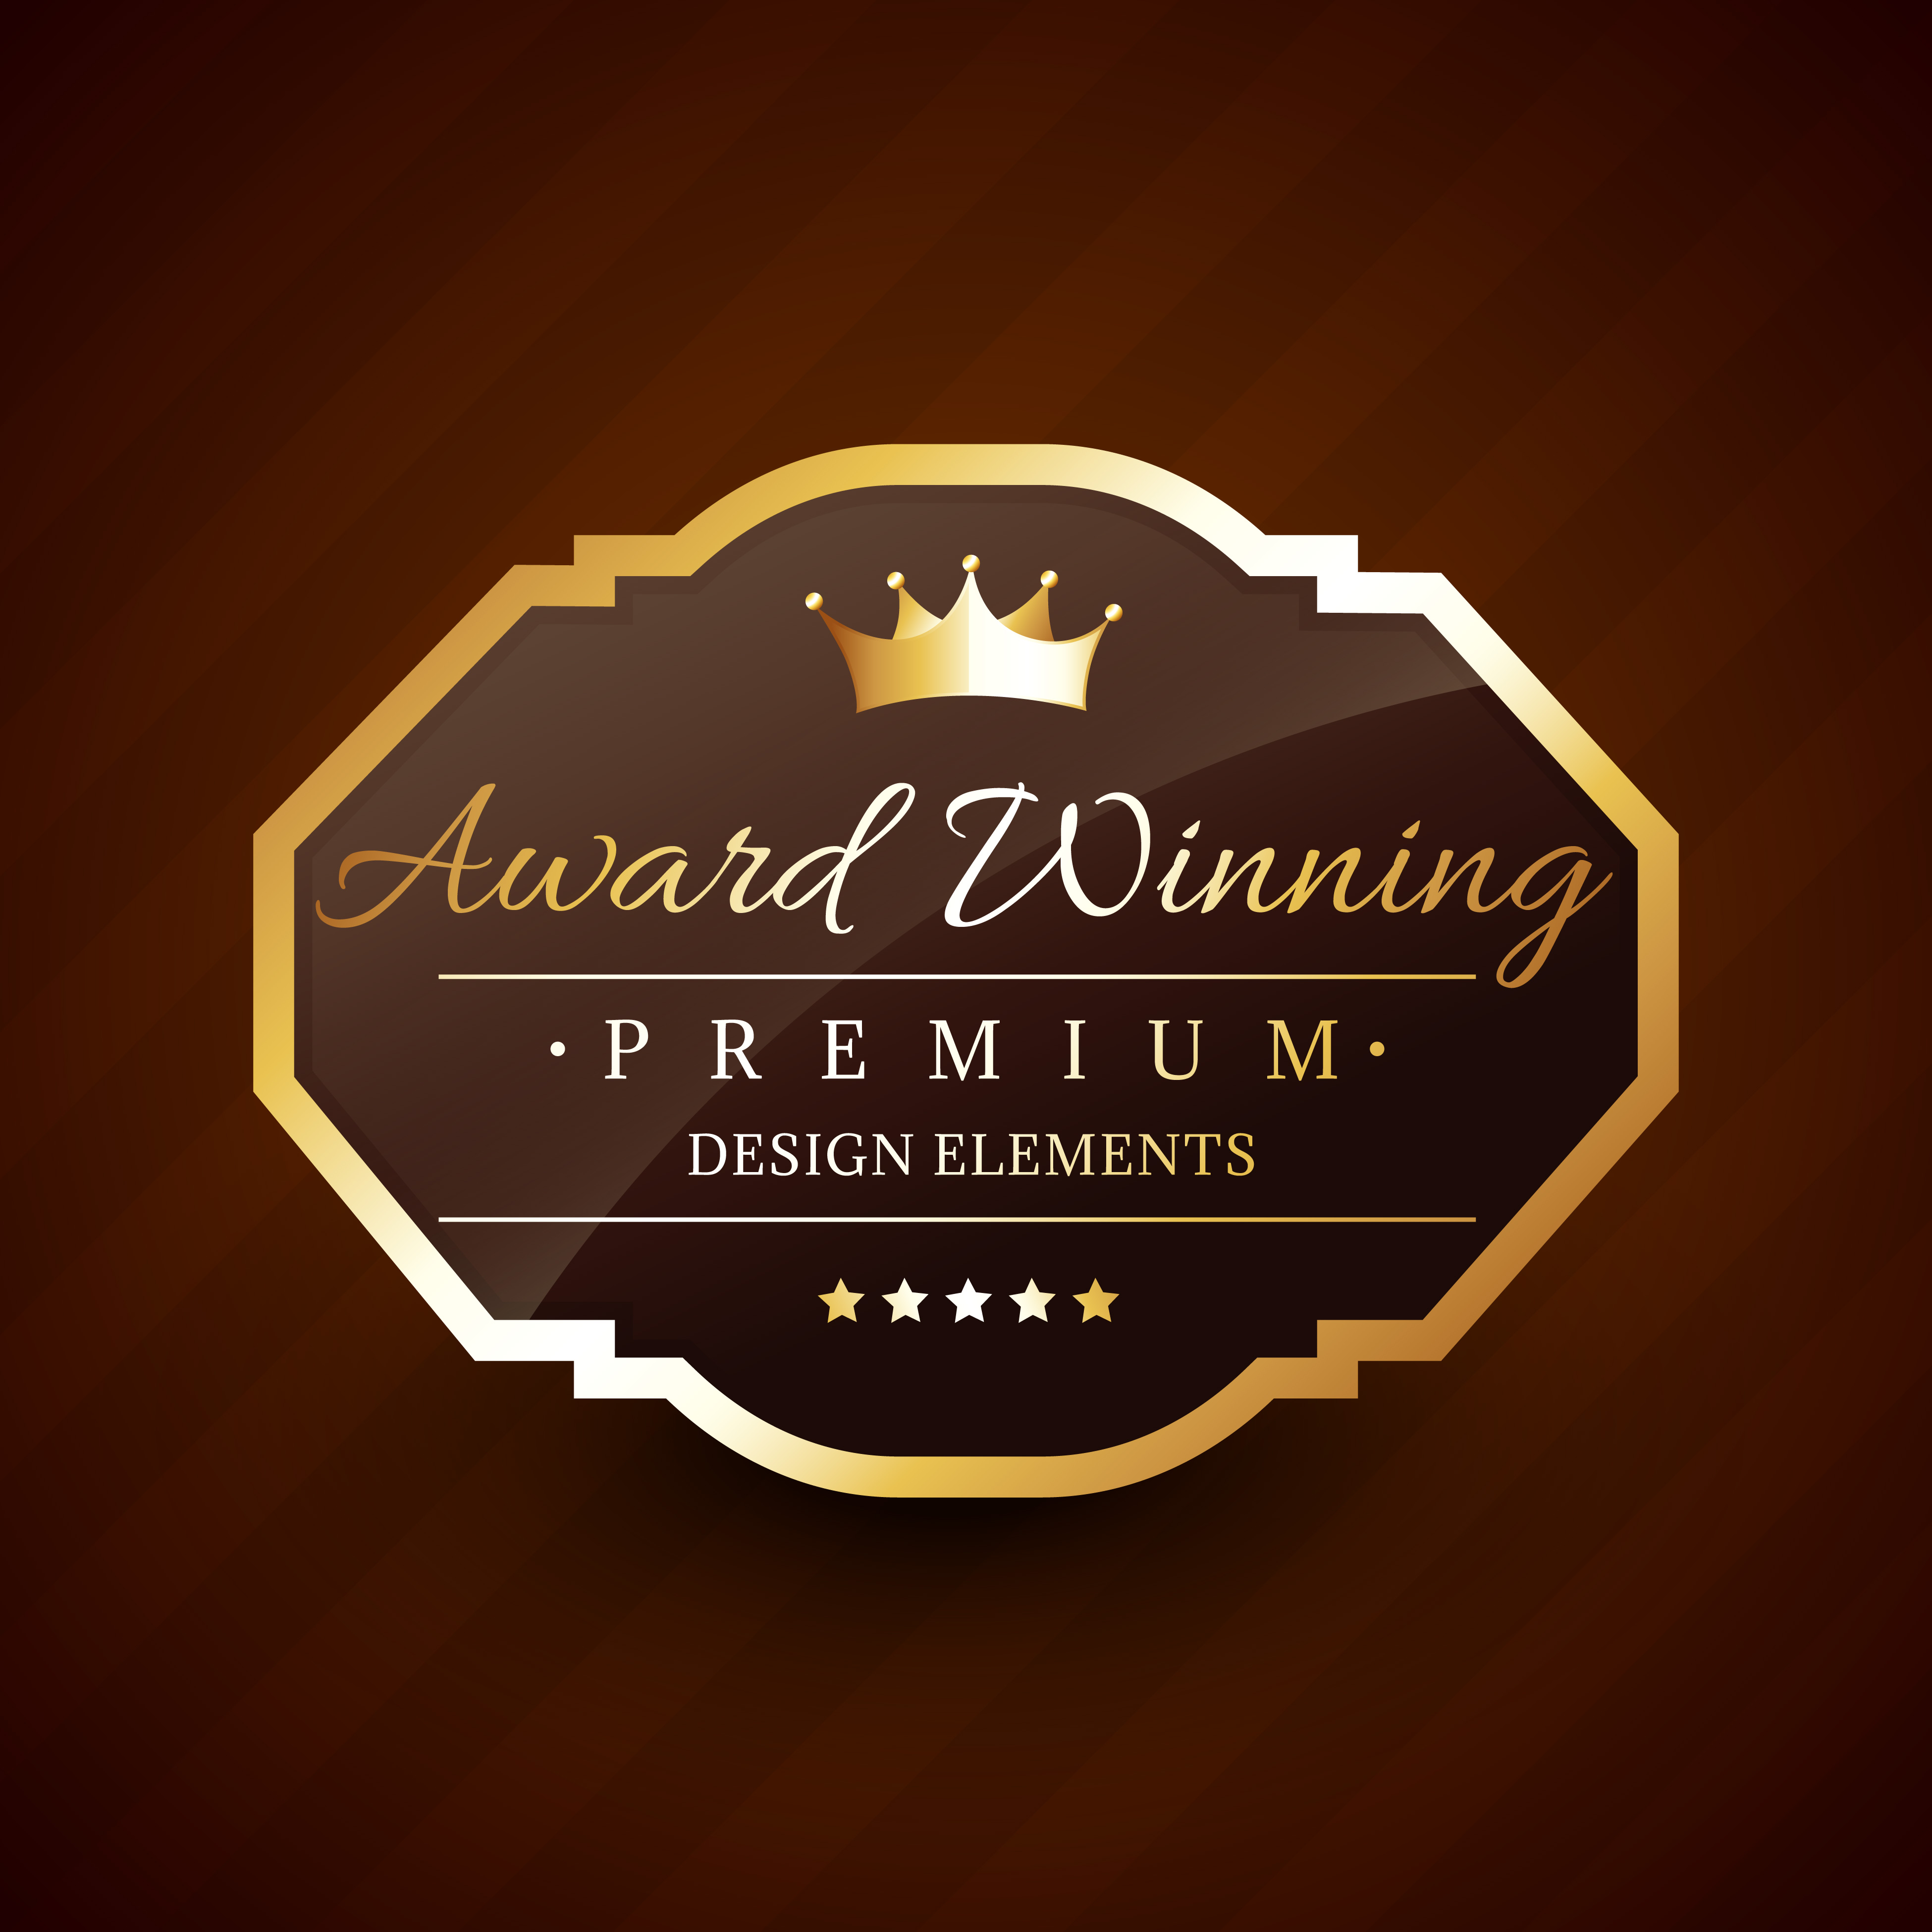 Award Winning Free Vector Art - (2378 Free Downloads)